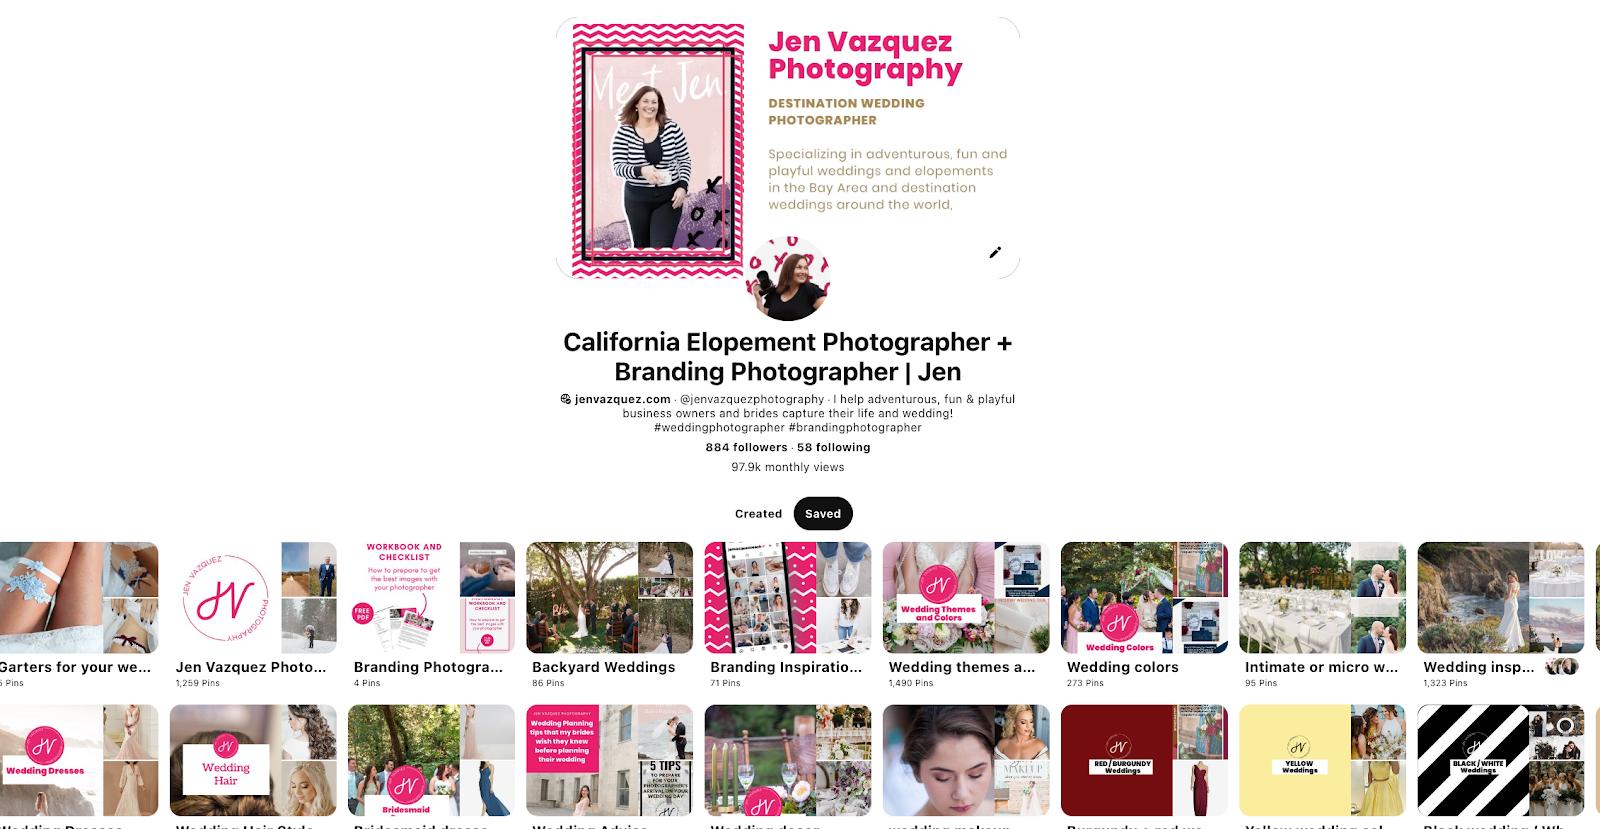 Pinterest Profile example by Jen Vazquez a Marketing Strategiest specializing in Pinterest Marketing